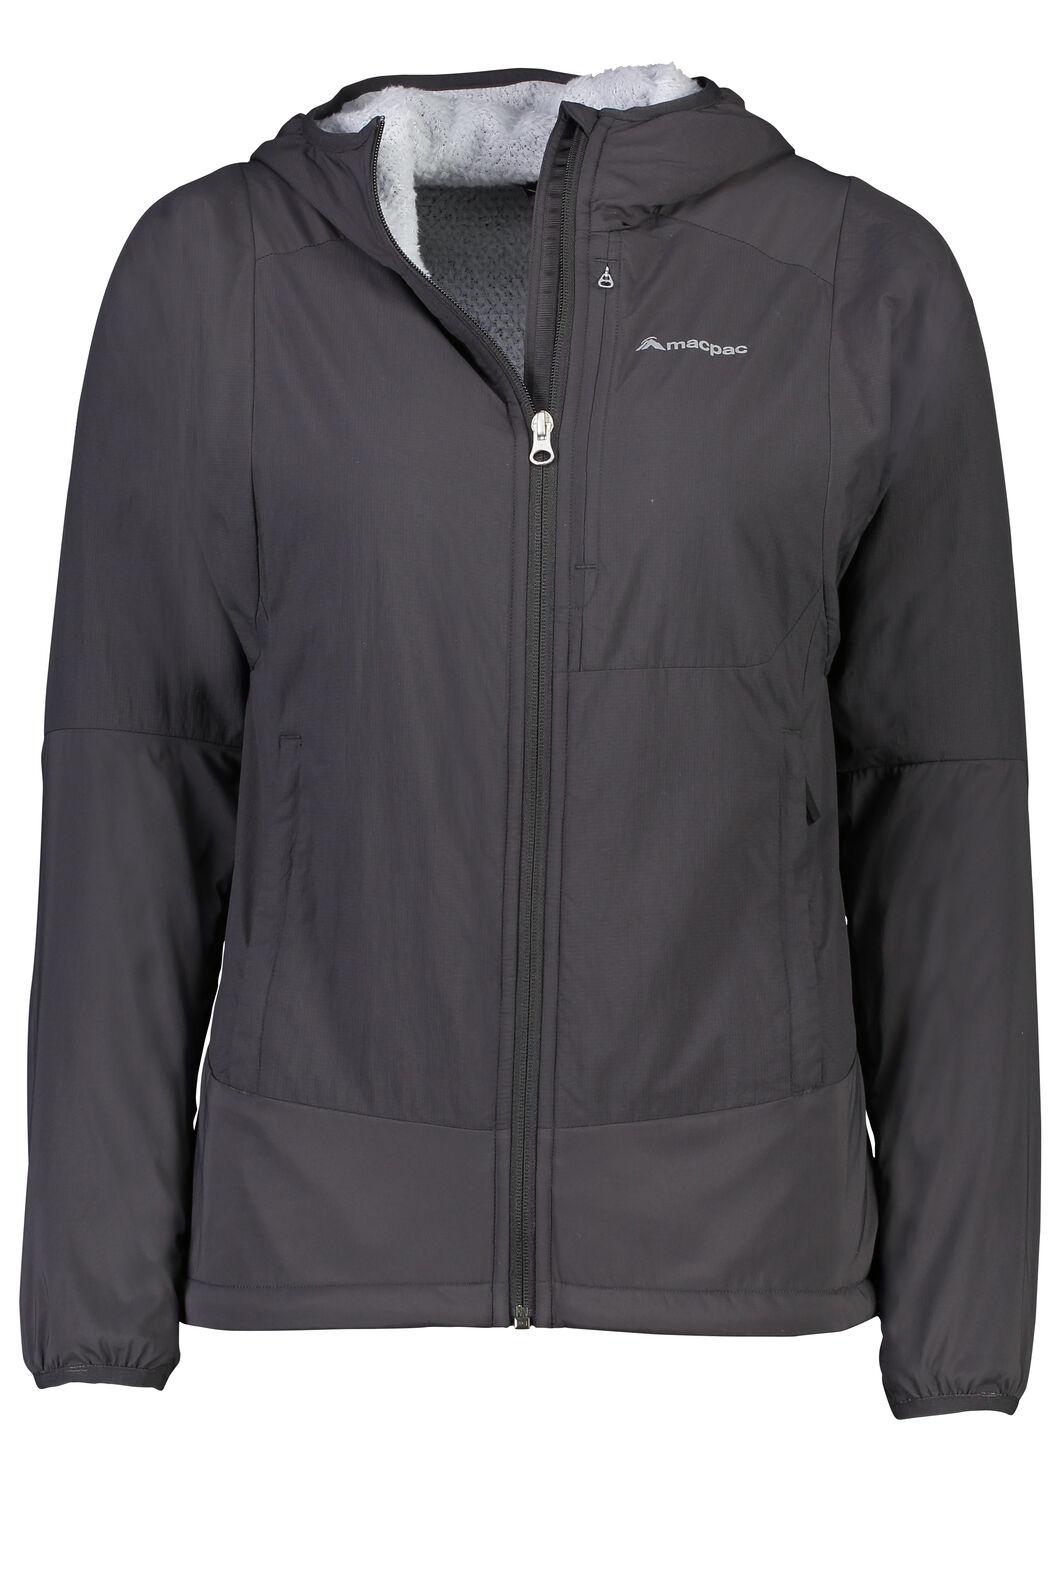 Pisa Polartec® Hooded Jacket - Women's, Phantom, hi-res